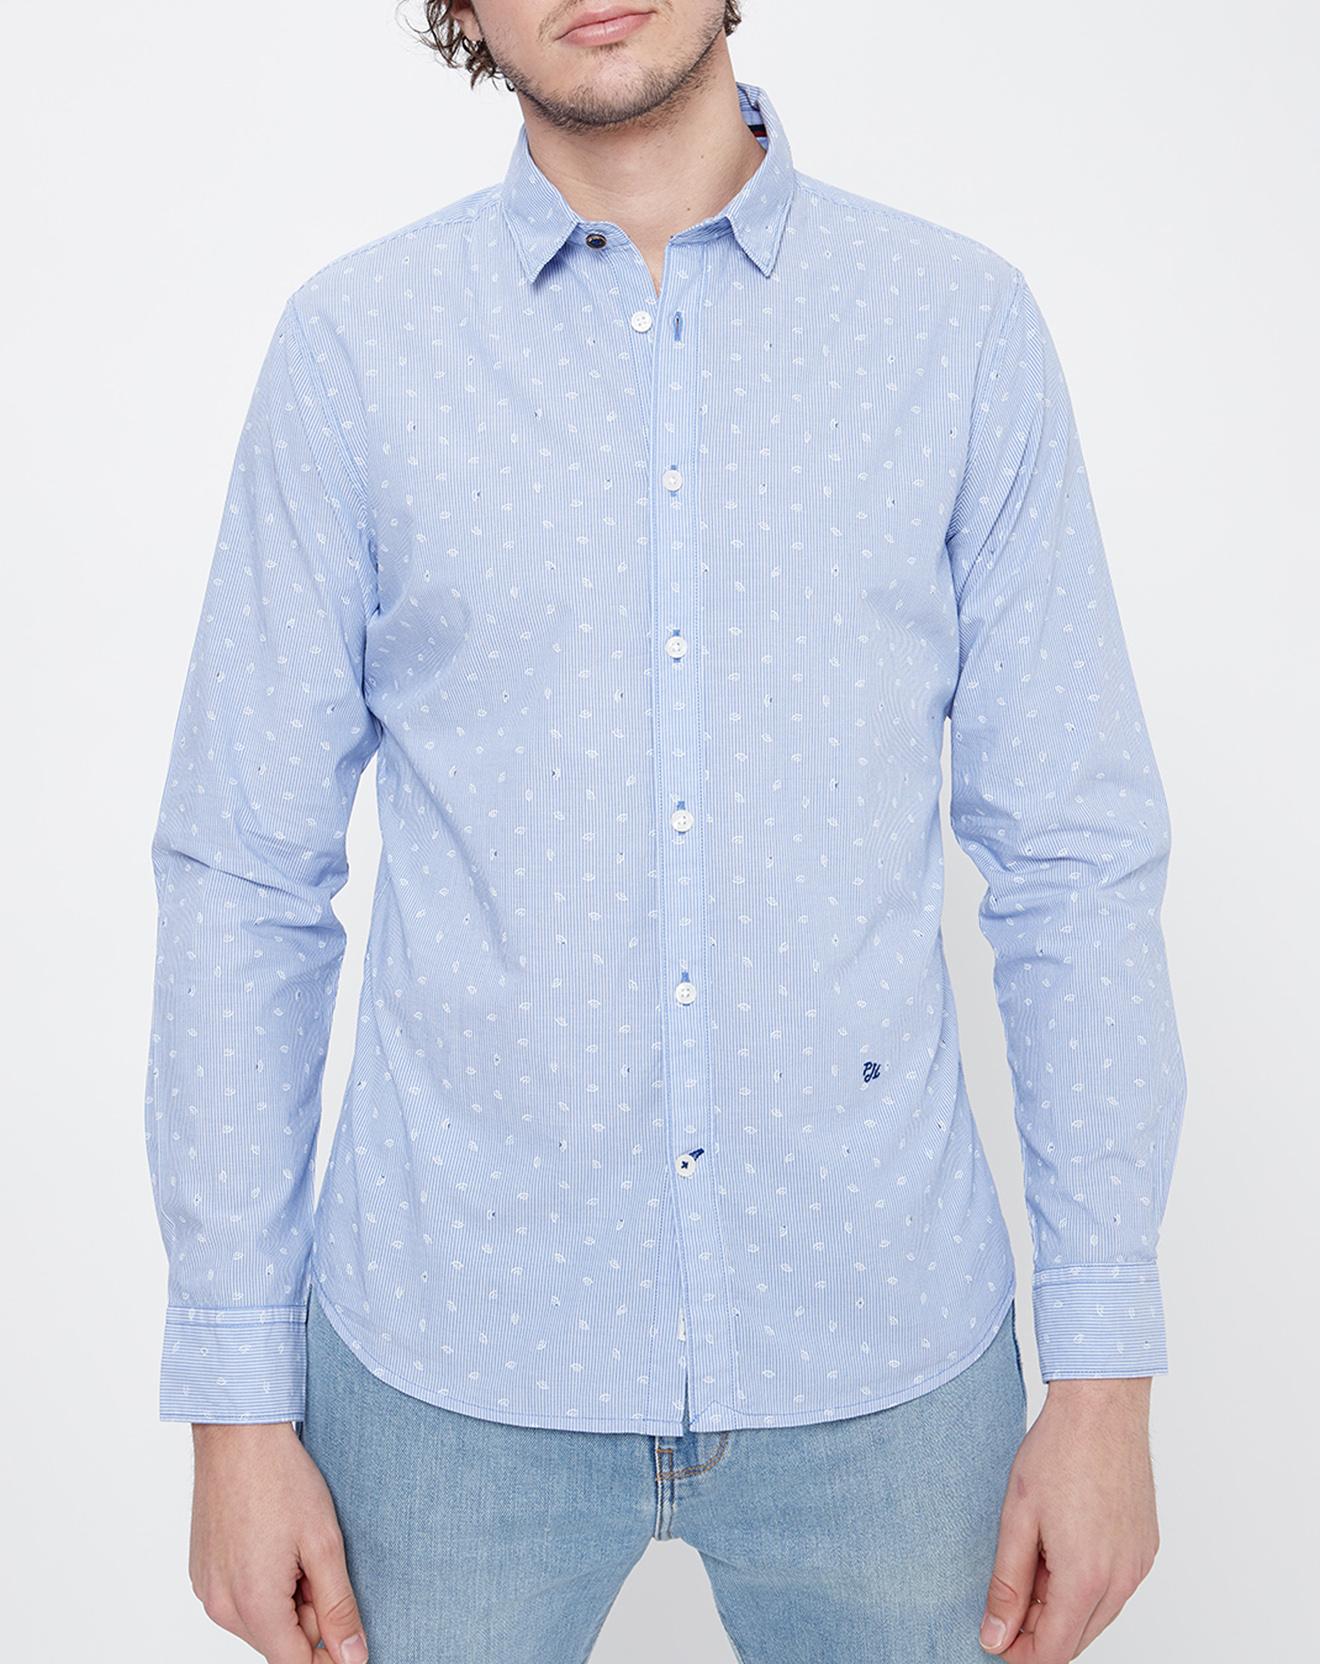 Chemise Slim fit Micro Lawson rayures & motif bleu clair/blanc - Pepe Jeans - Modalova